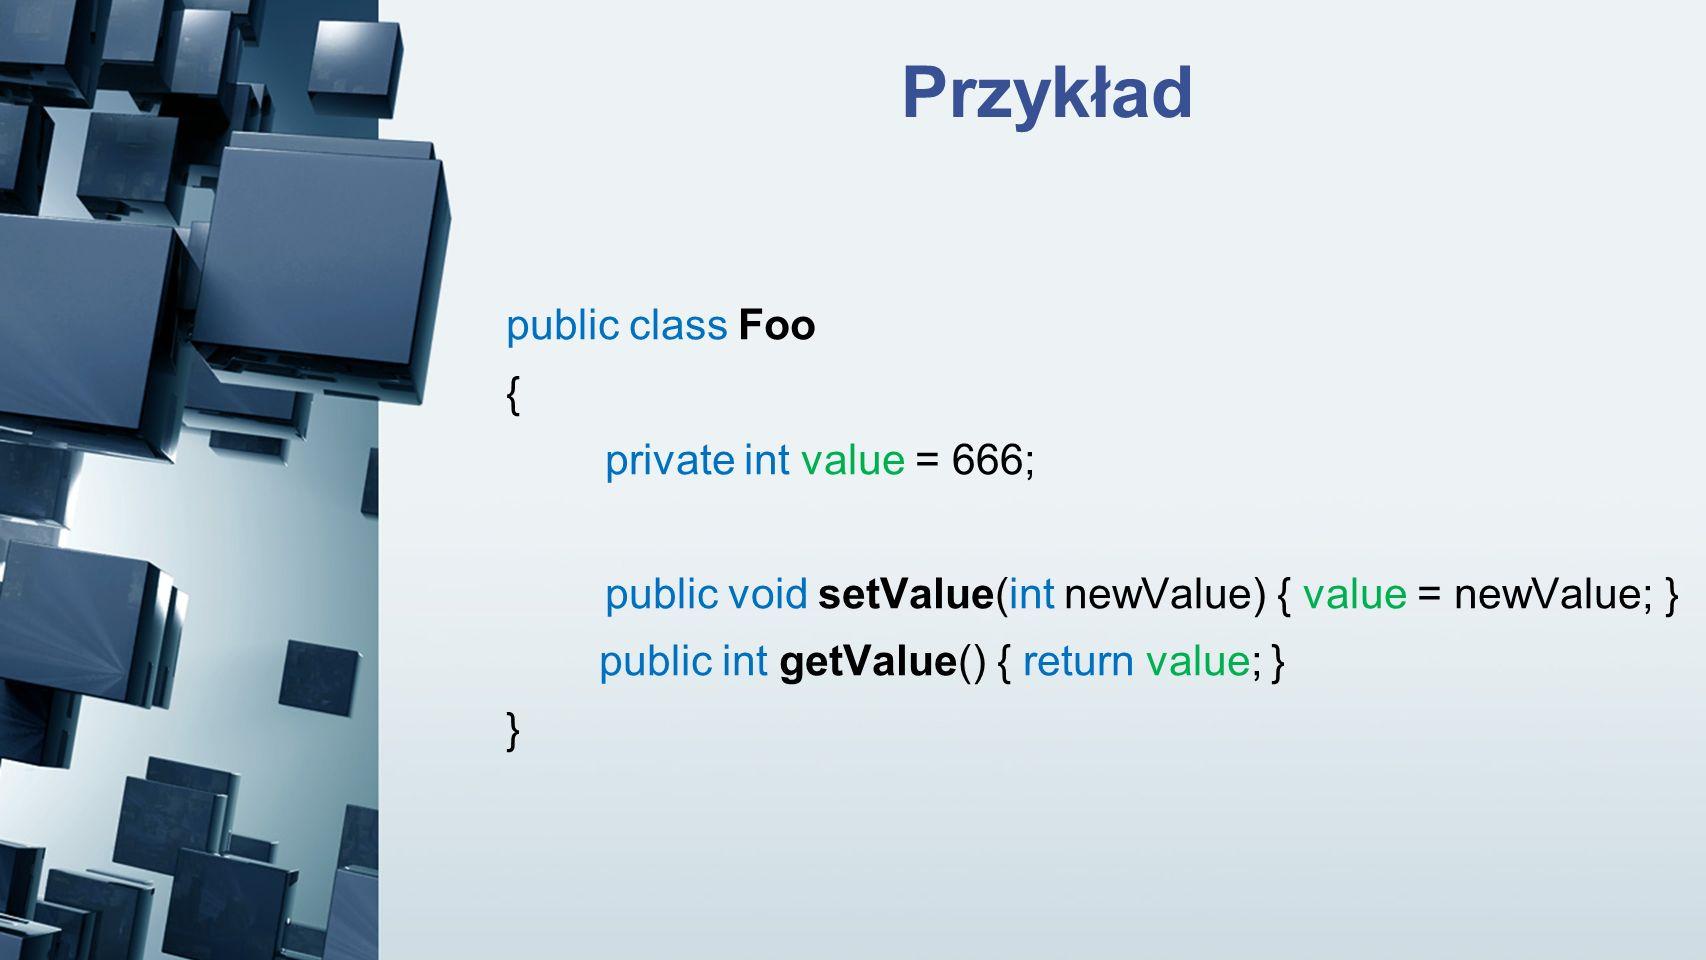 Przykład public class Foo { private int value = 666;